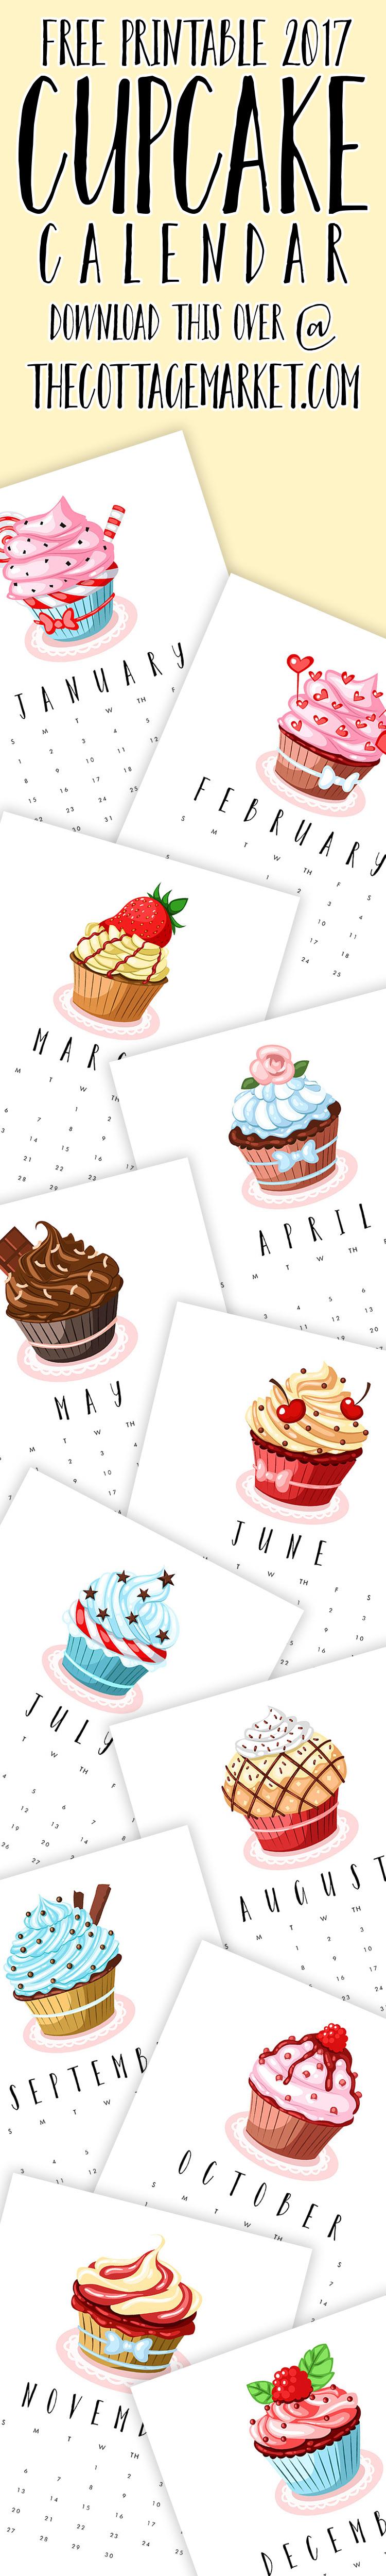 TCM-Cupcake-2017-Calendar-Tower